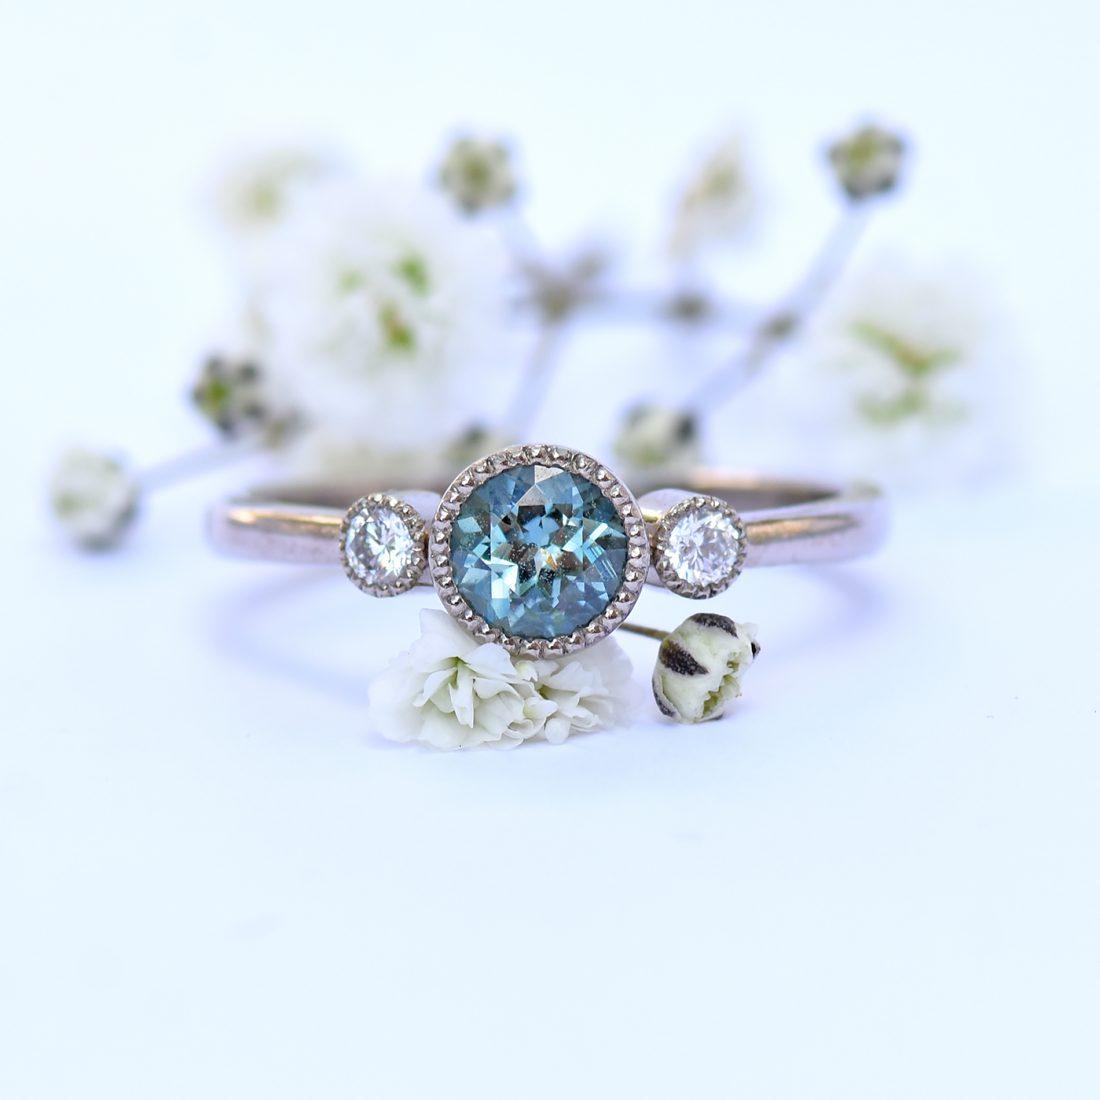 White Gold Diamond & Sapphire Engagement Ring